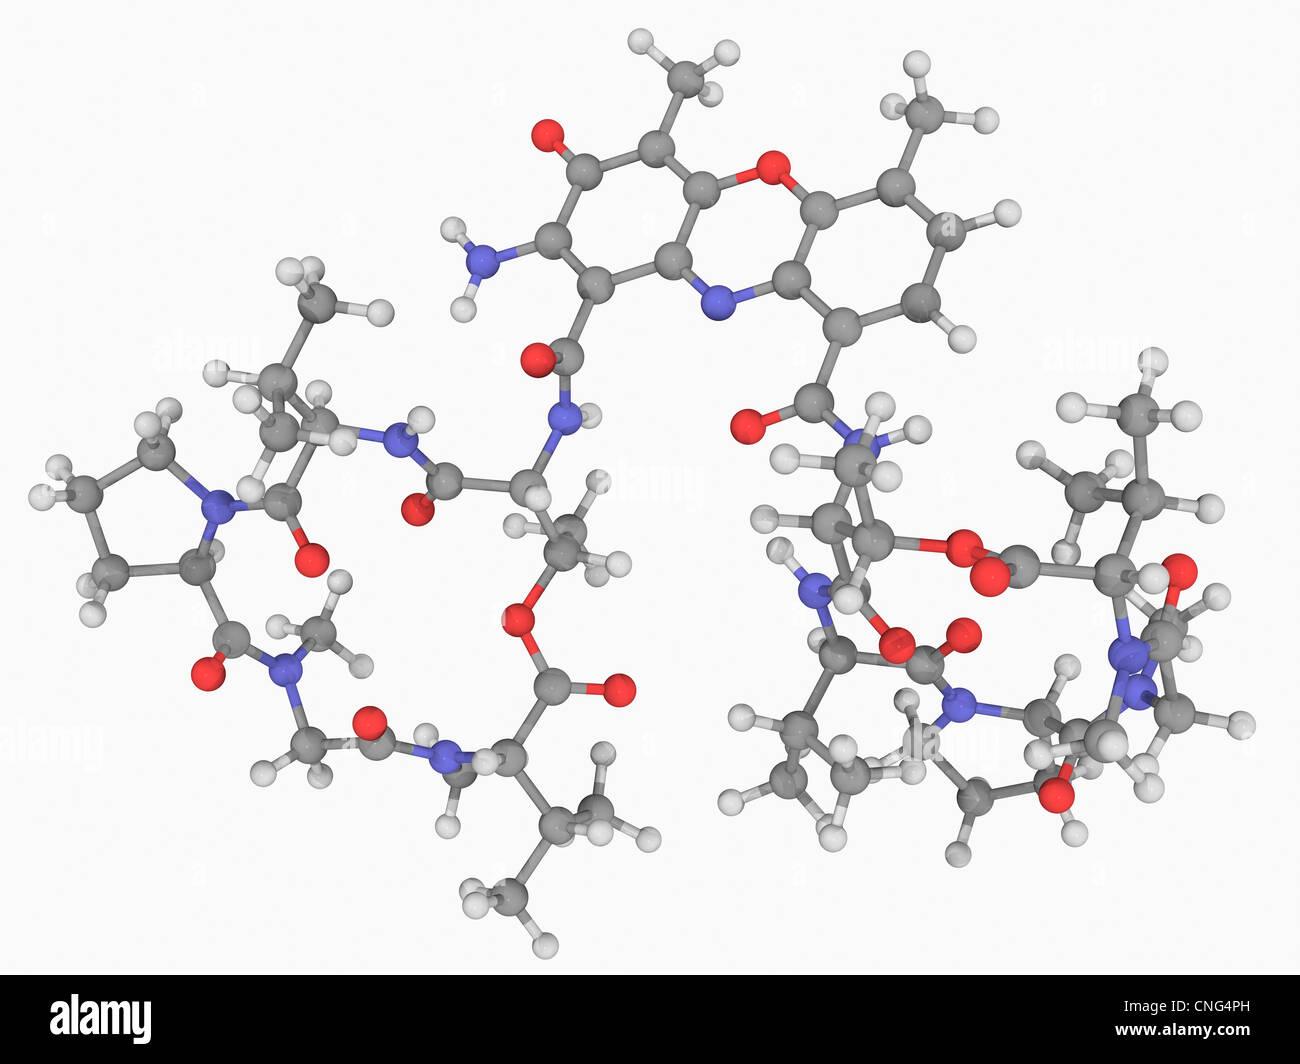 Actinomycin D drug molecule - Stock Image